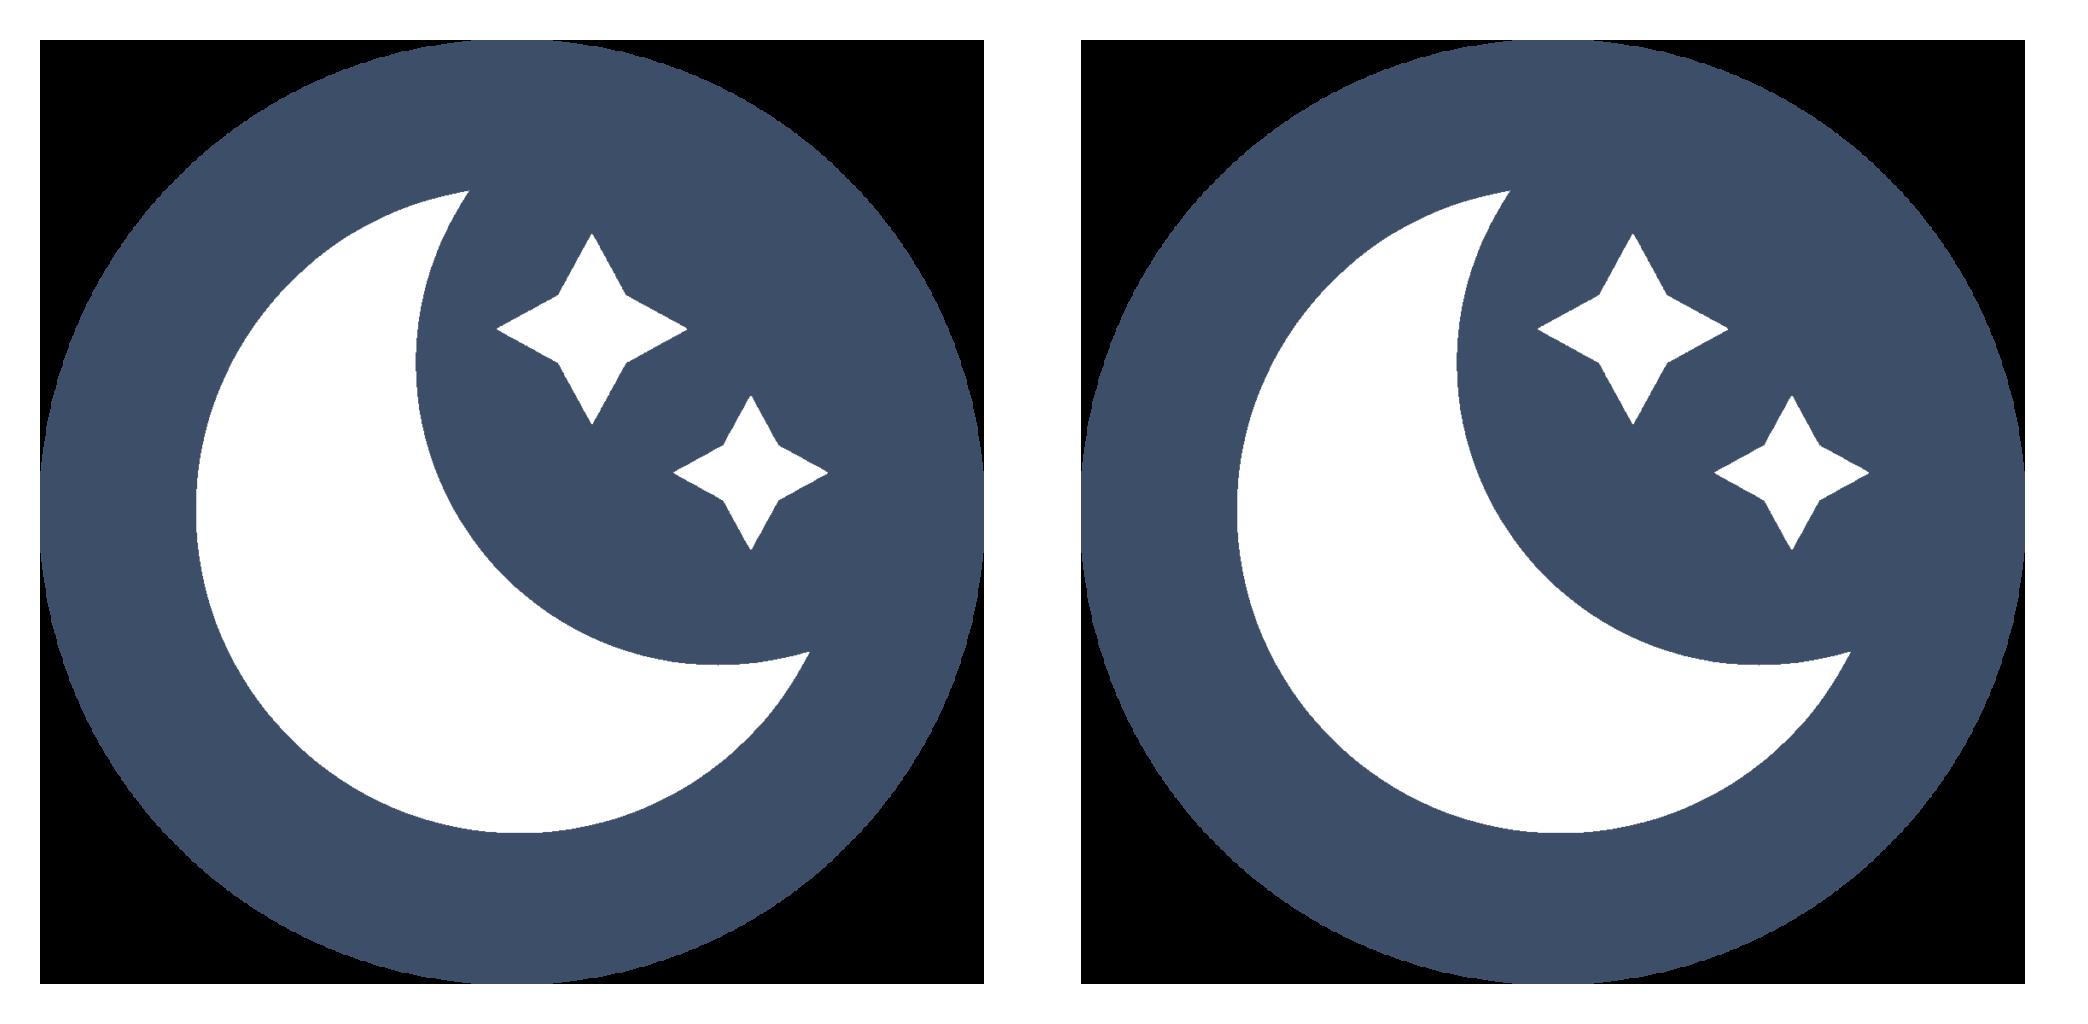 2 moons